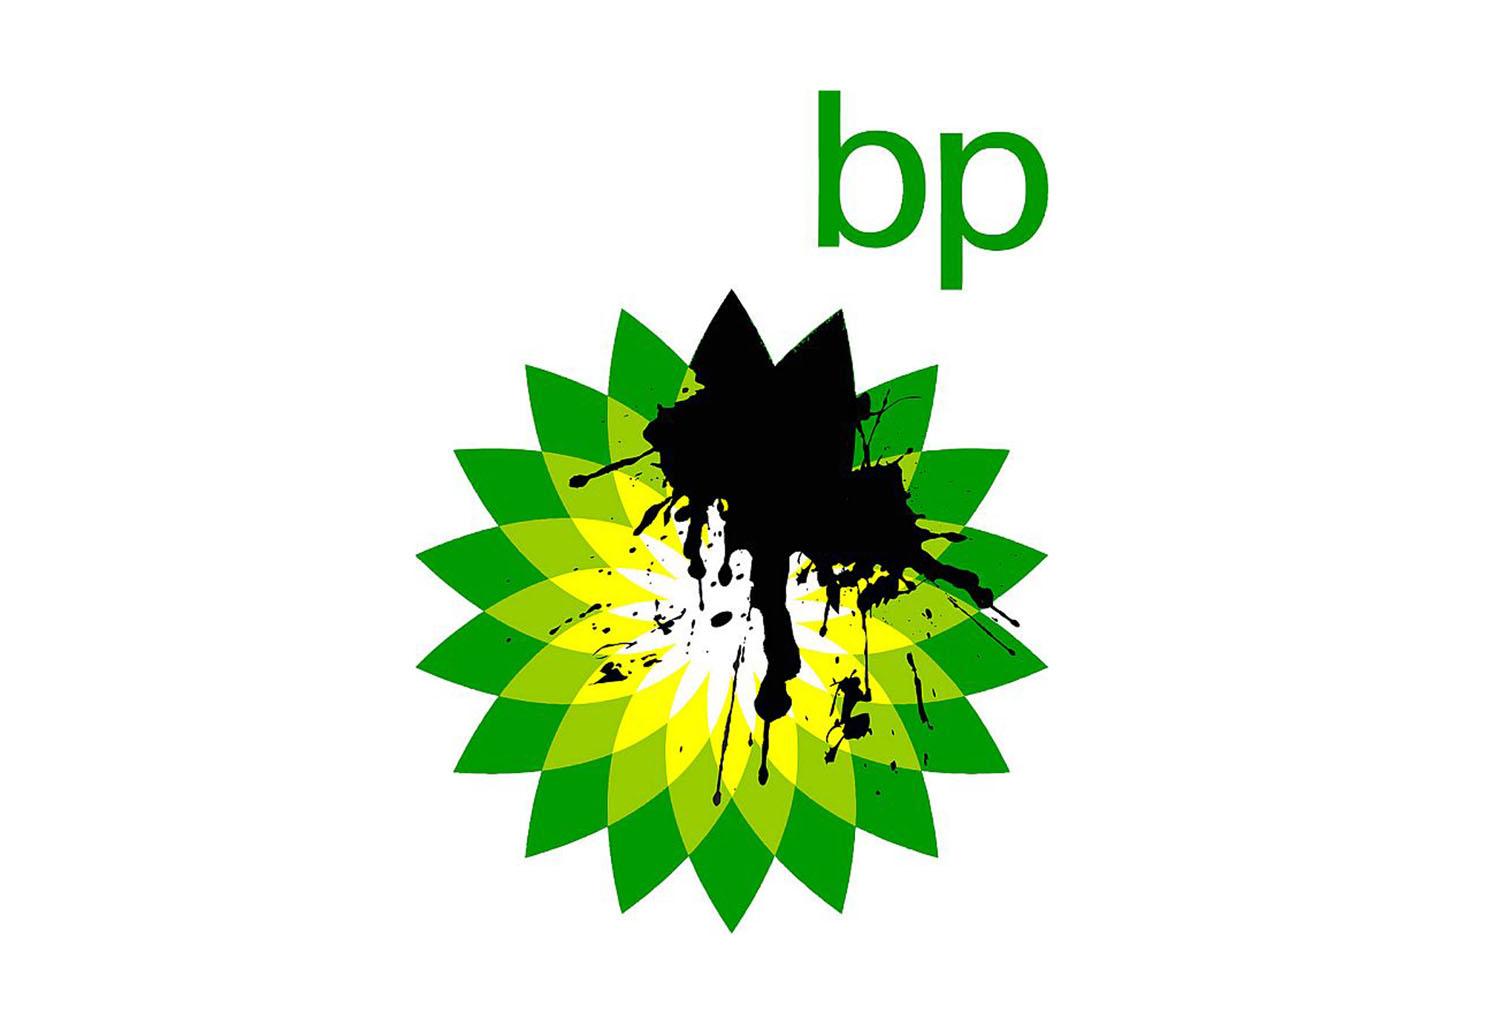 http://1.bp.blogspot.com/_RcXNb22Yfz8/TAjd5_AbKzI/AAAAAAAADis/o-t3h9rEHFM/s1600/bp_greenpeace_contest_entry3.jpg